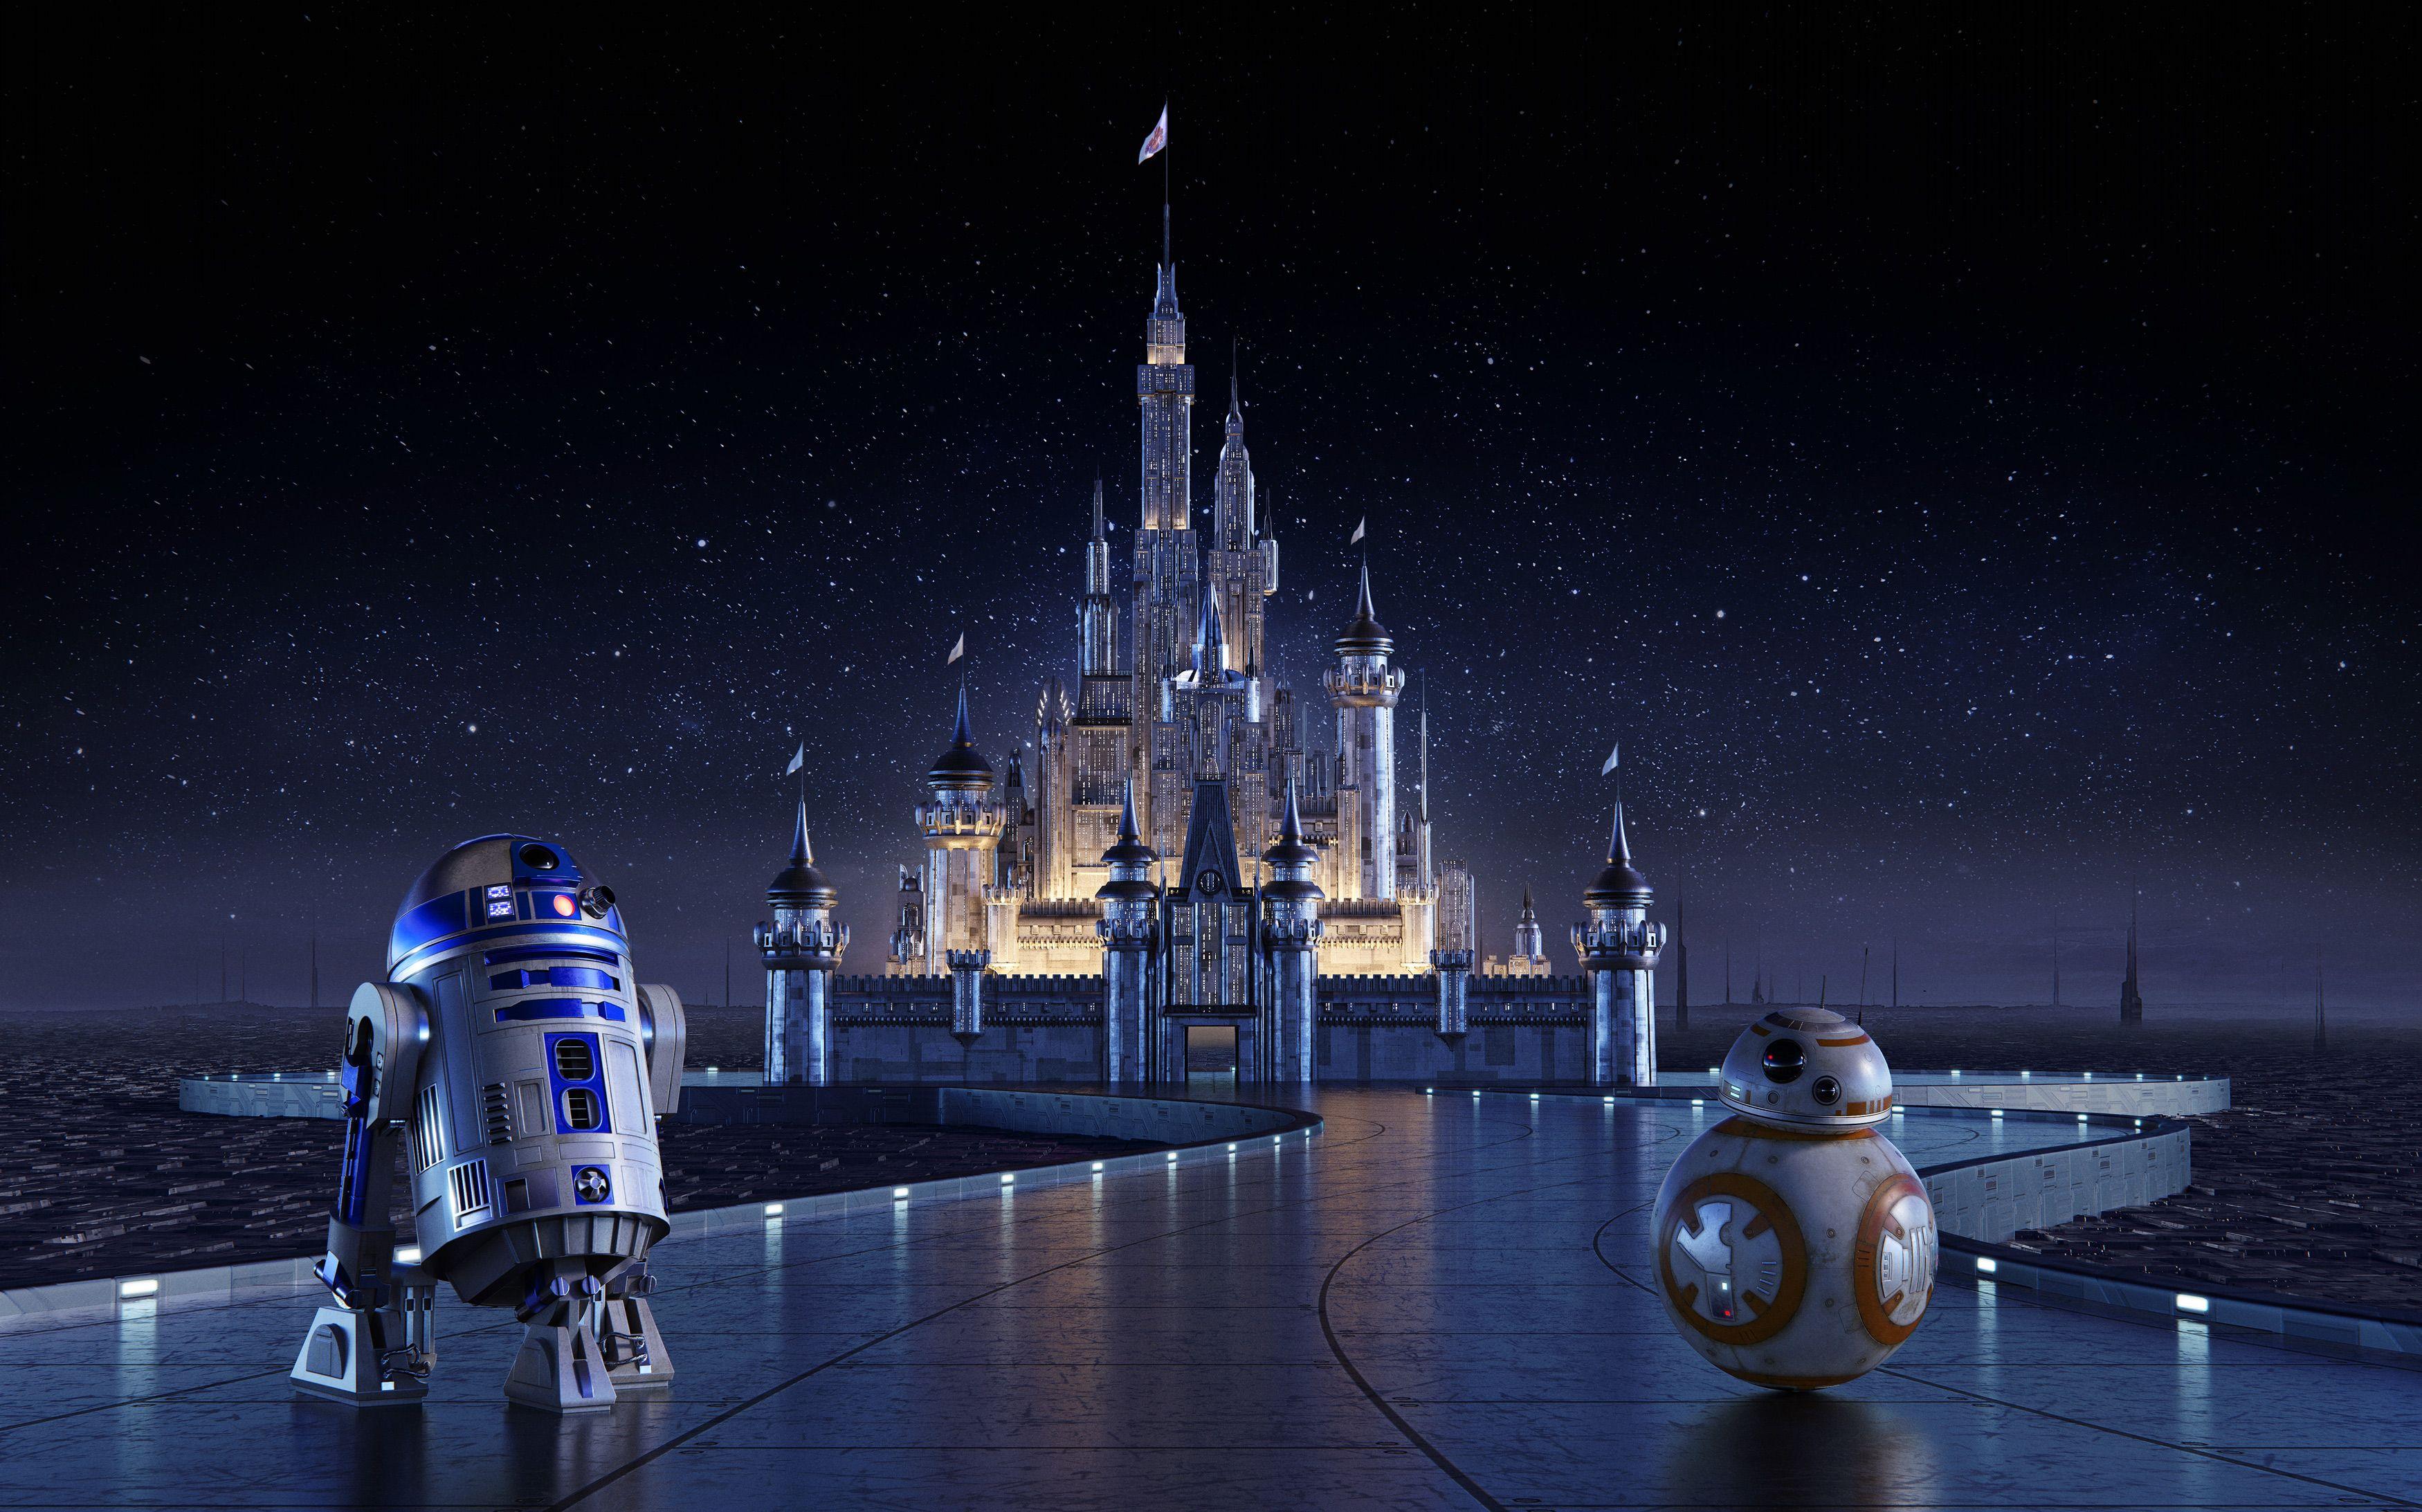 Disney Castle Wallpaper Hd Resolution Star Wars Wallpaper Star Wars Background Disney Star Wars